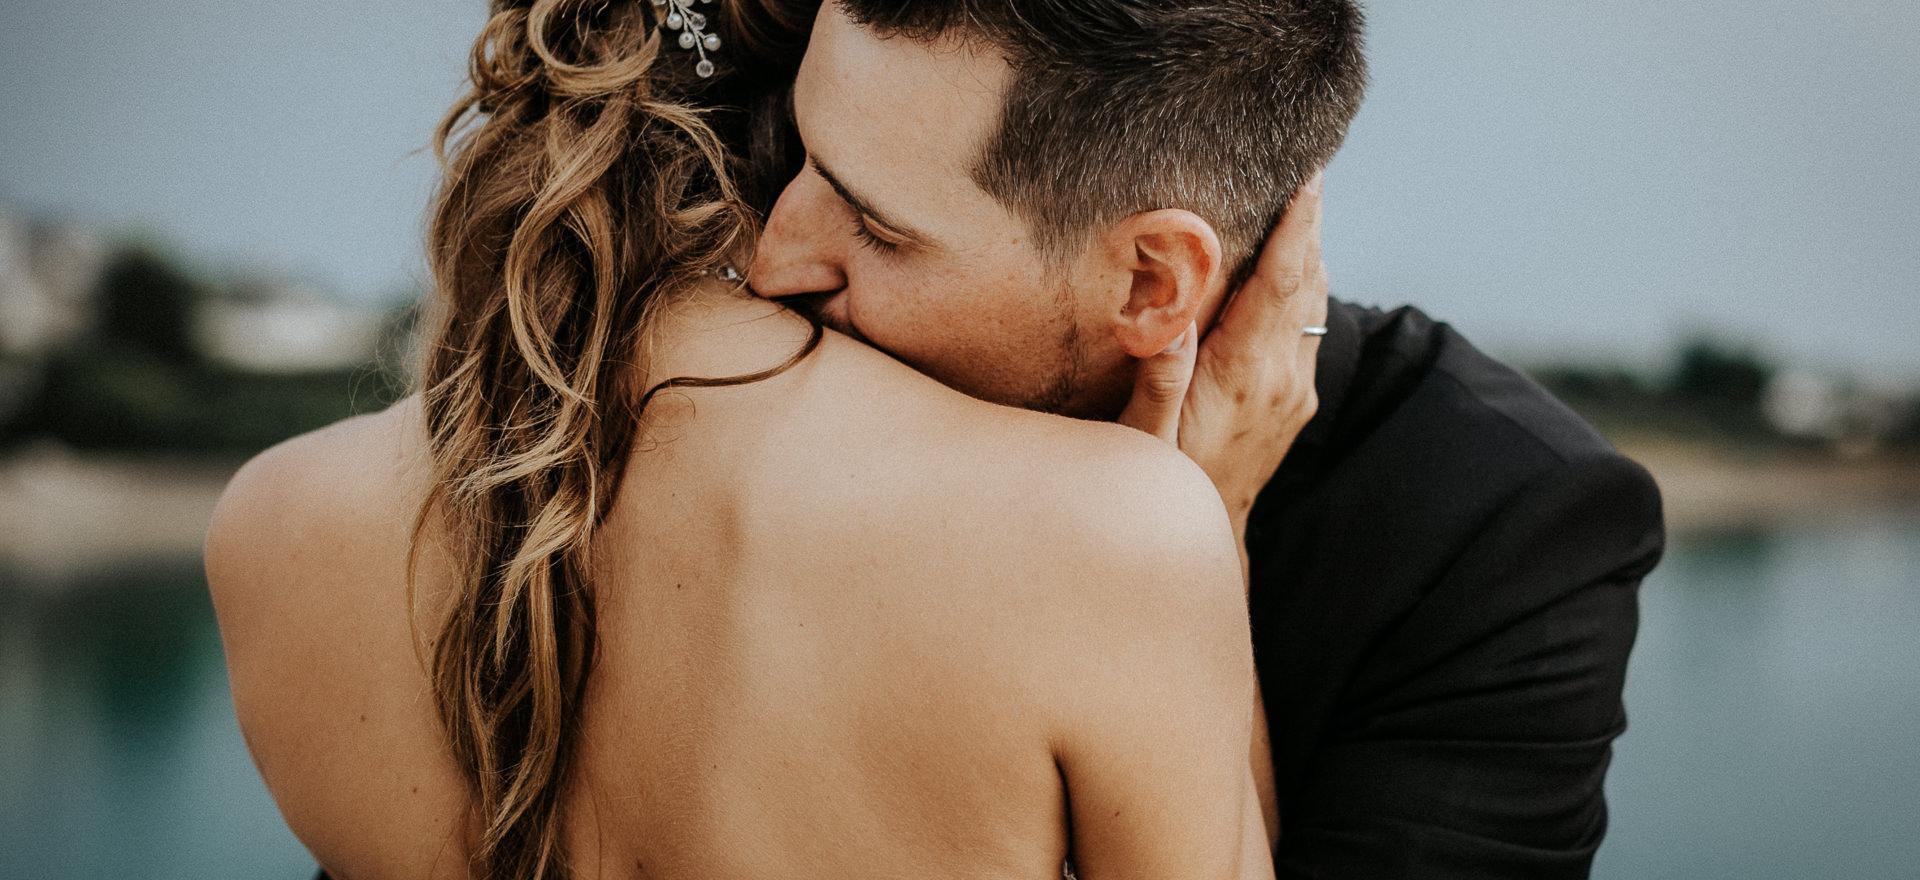 Hochzeit Fotograf Fontana